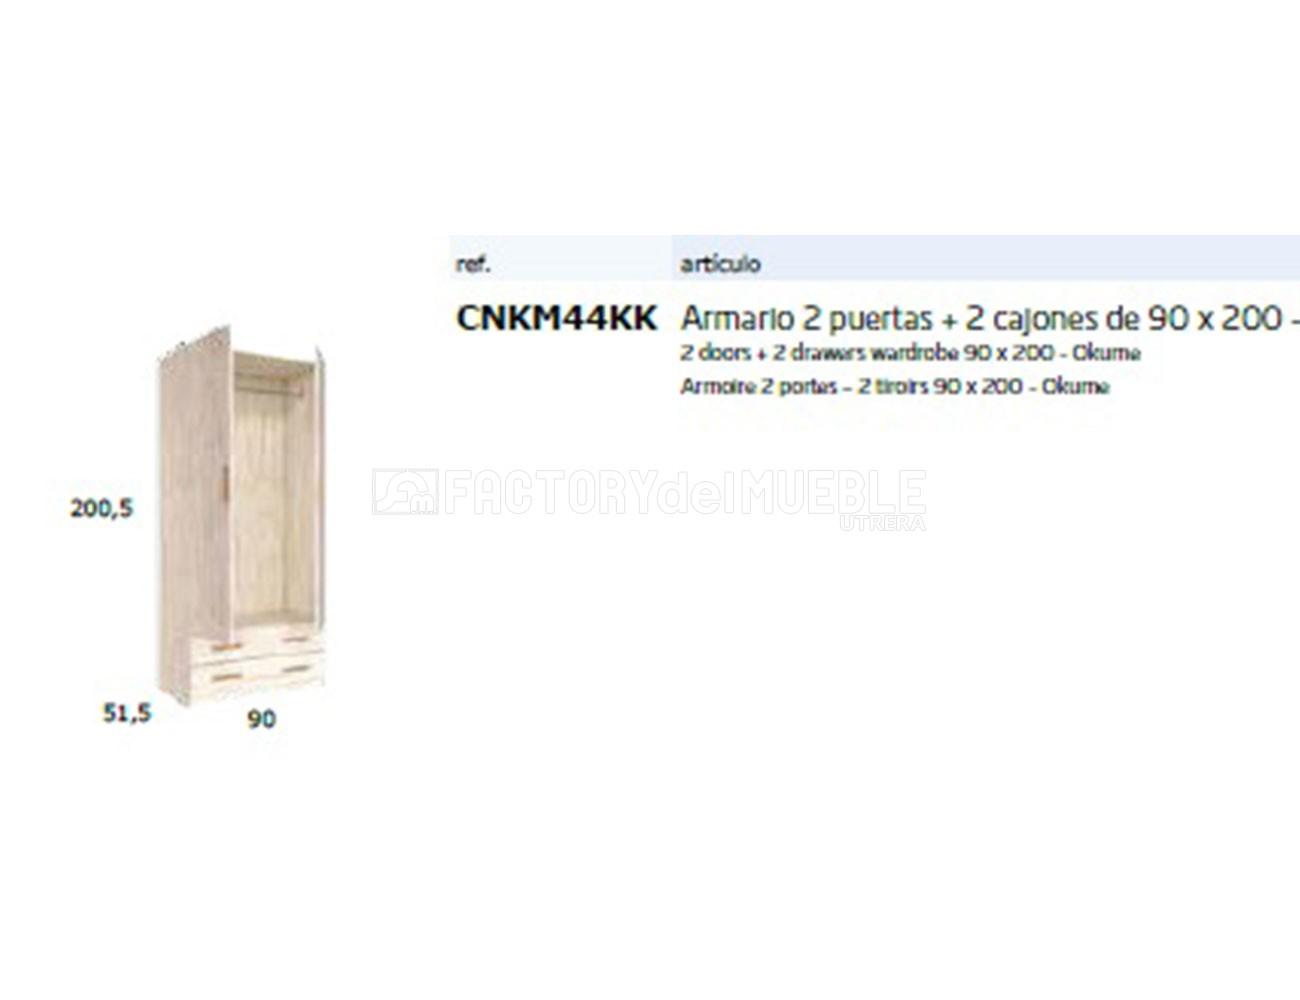 Cnkm44kk armario2 puertas+2 cajones